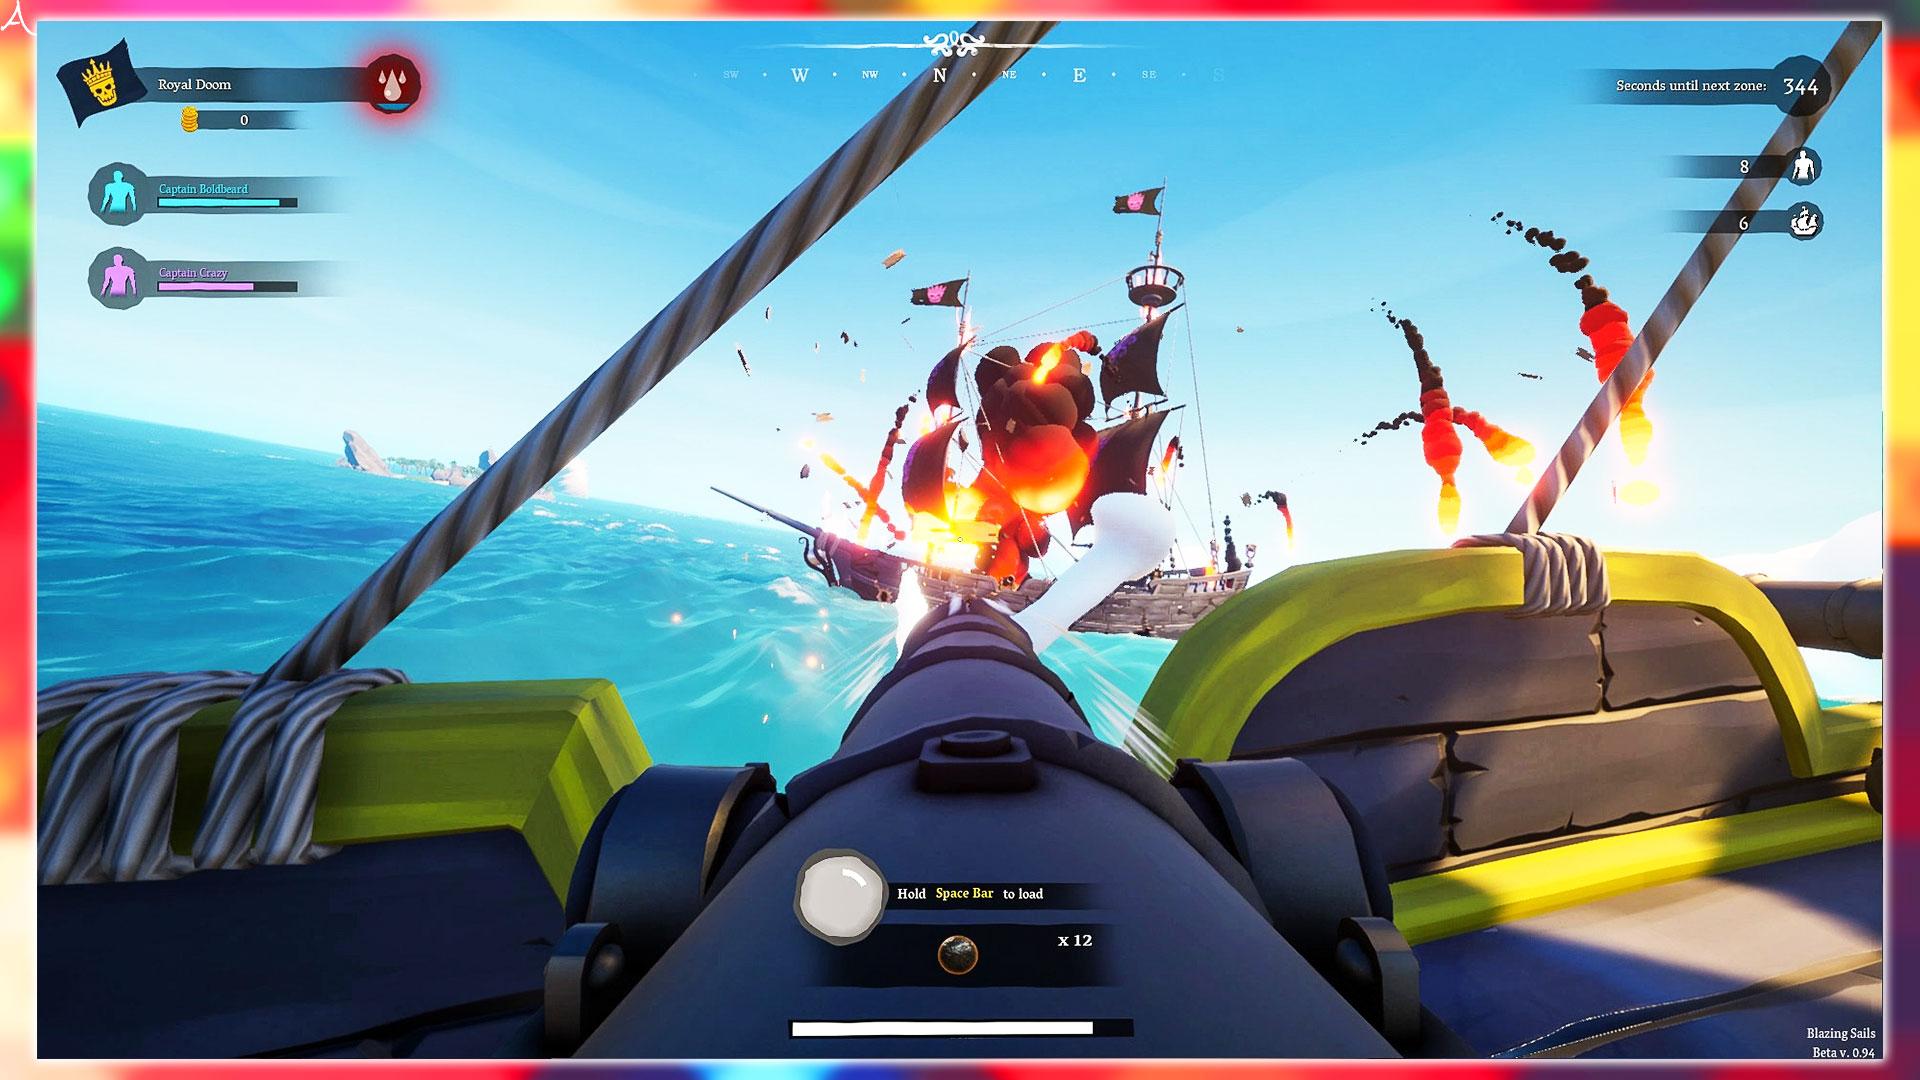 PC版「Blazing Sails: Pirate Battle Royale」に必要な最低/推奨スペックを確認